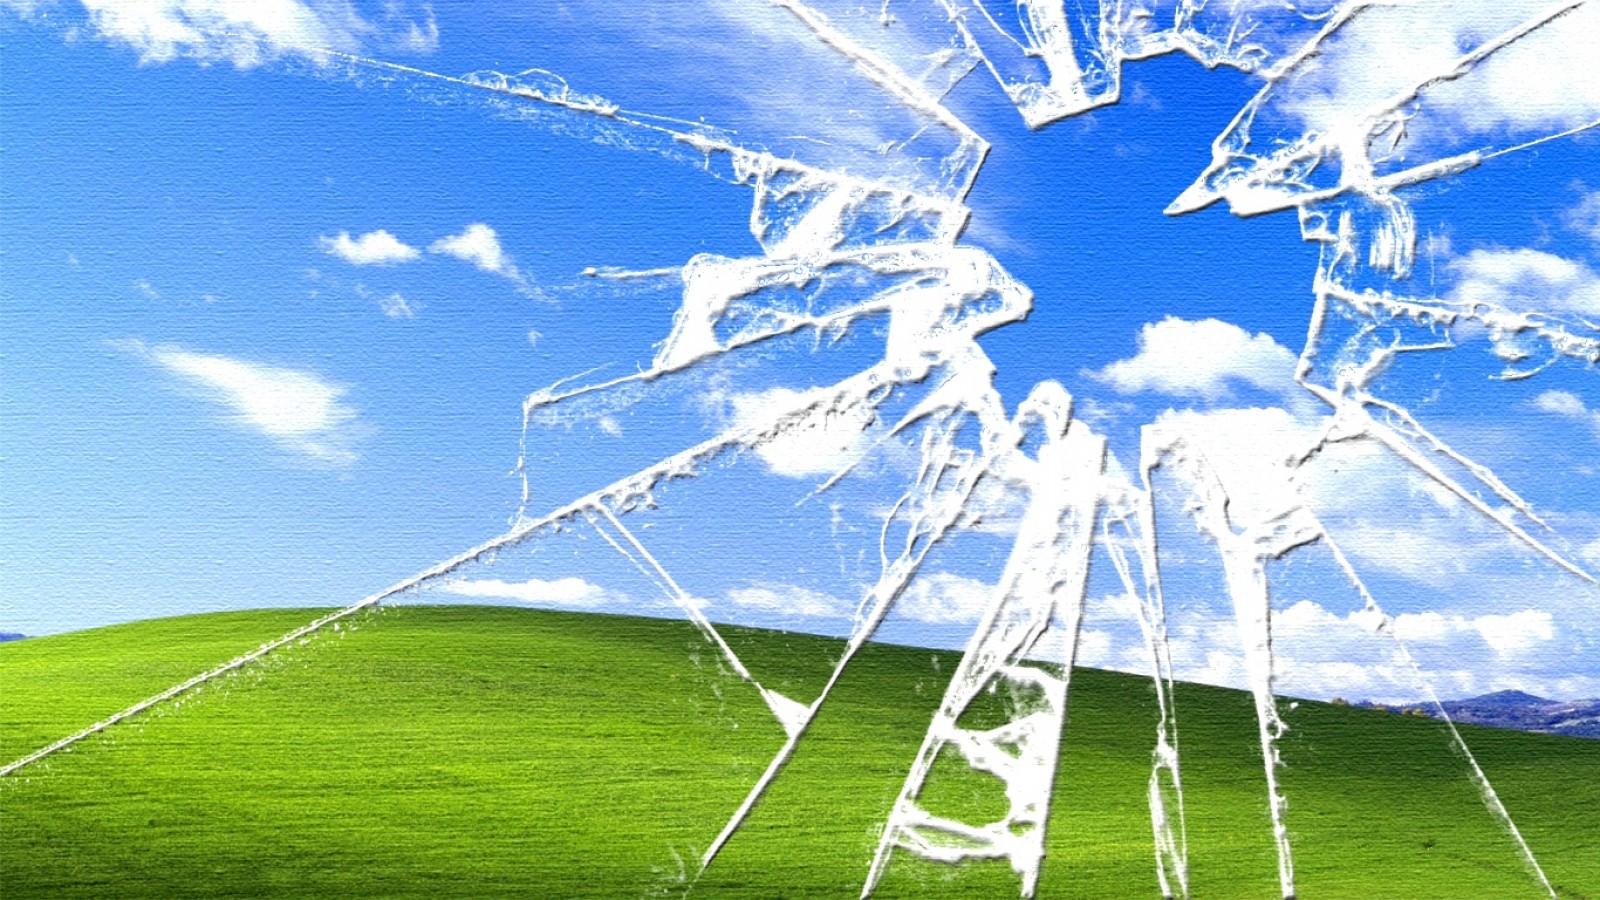 Cracked Screen Wallpaper 1600x900